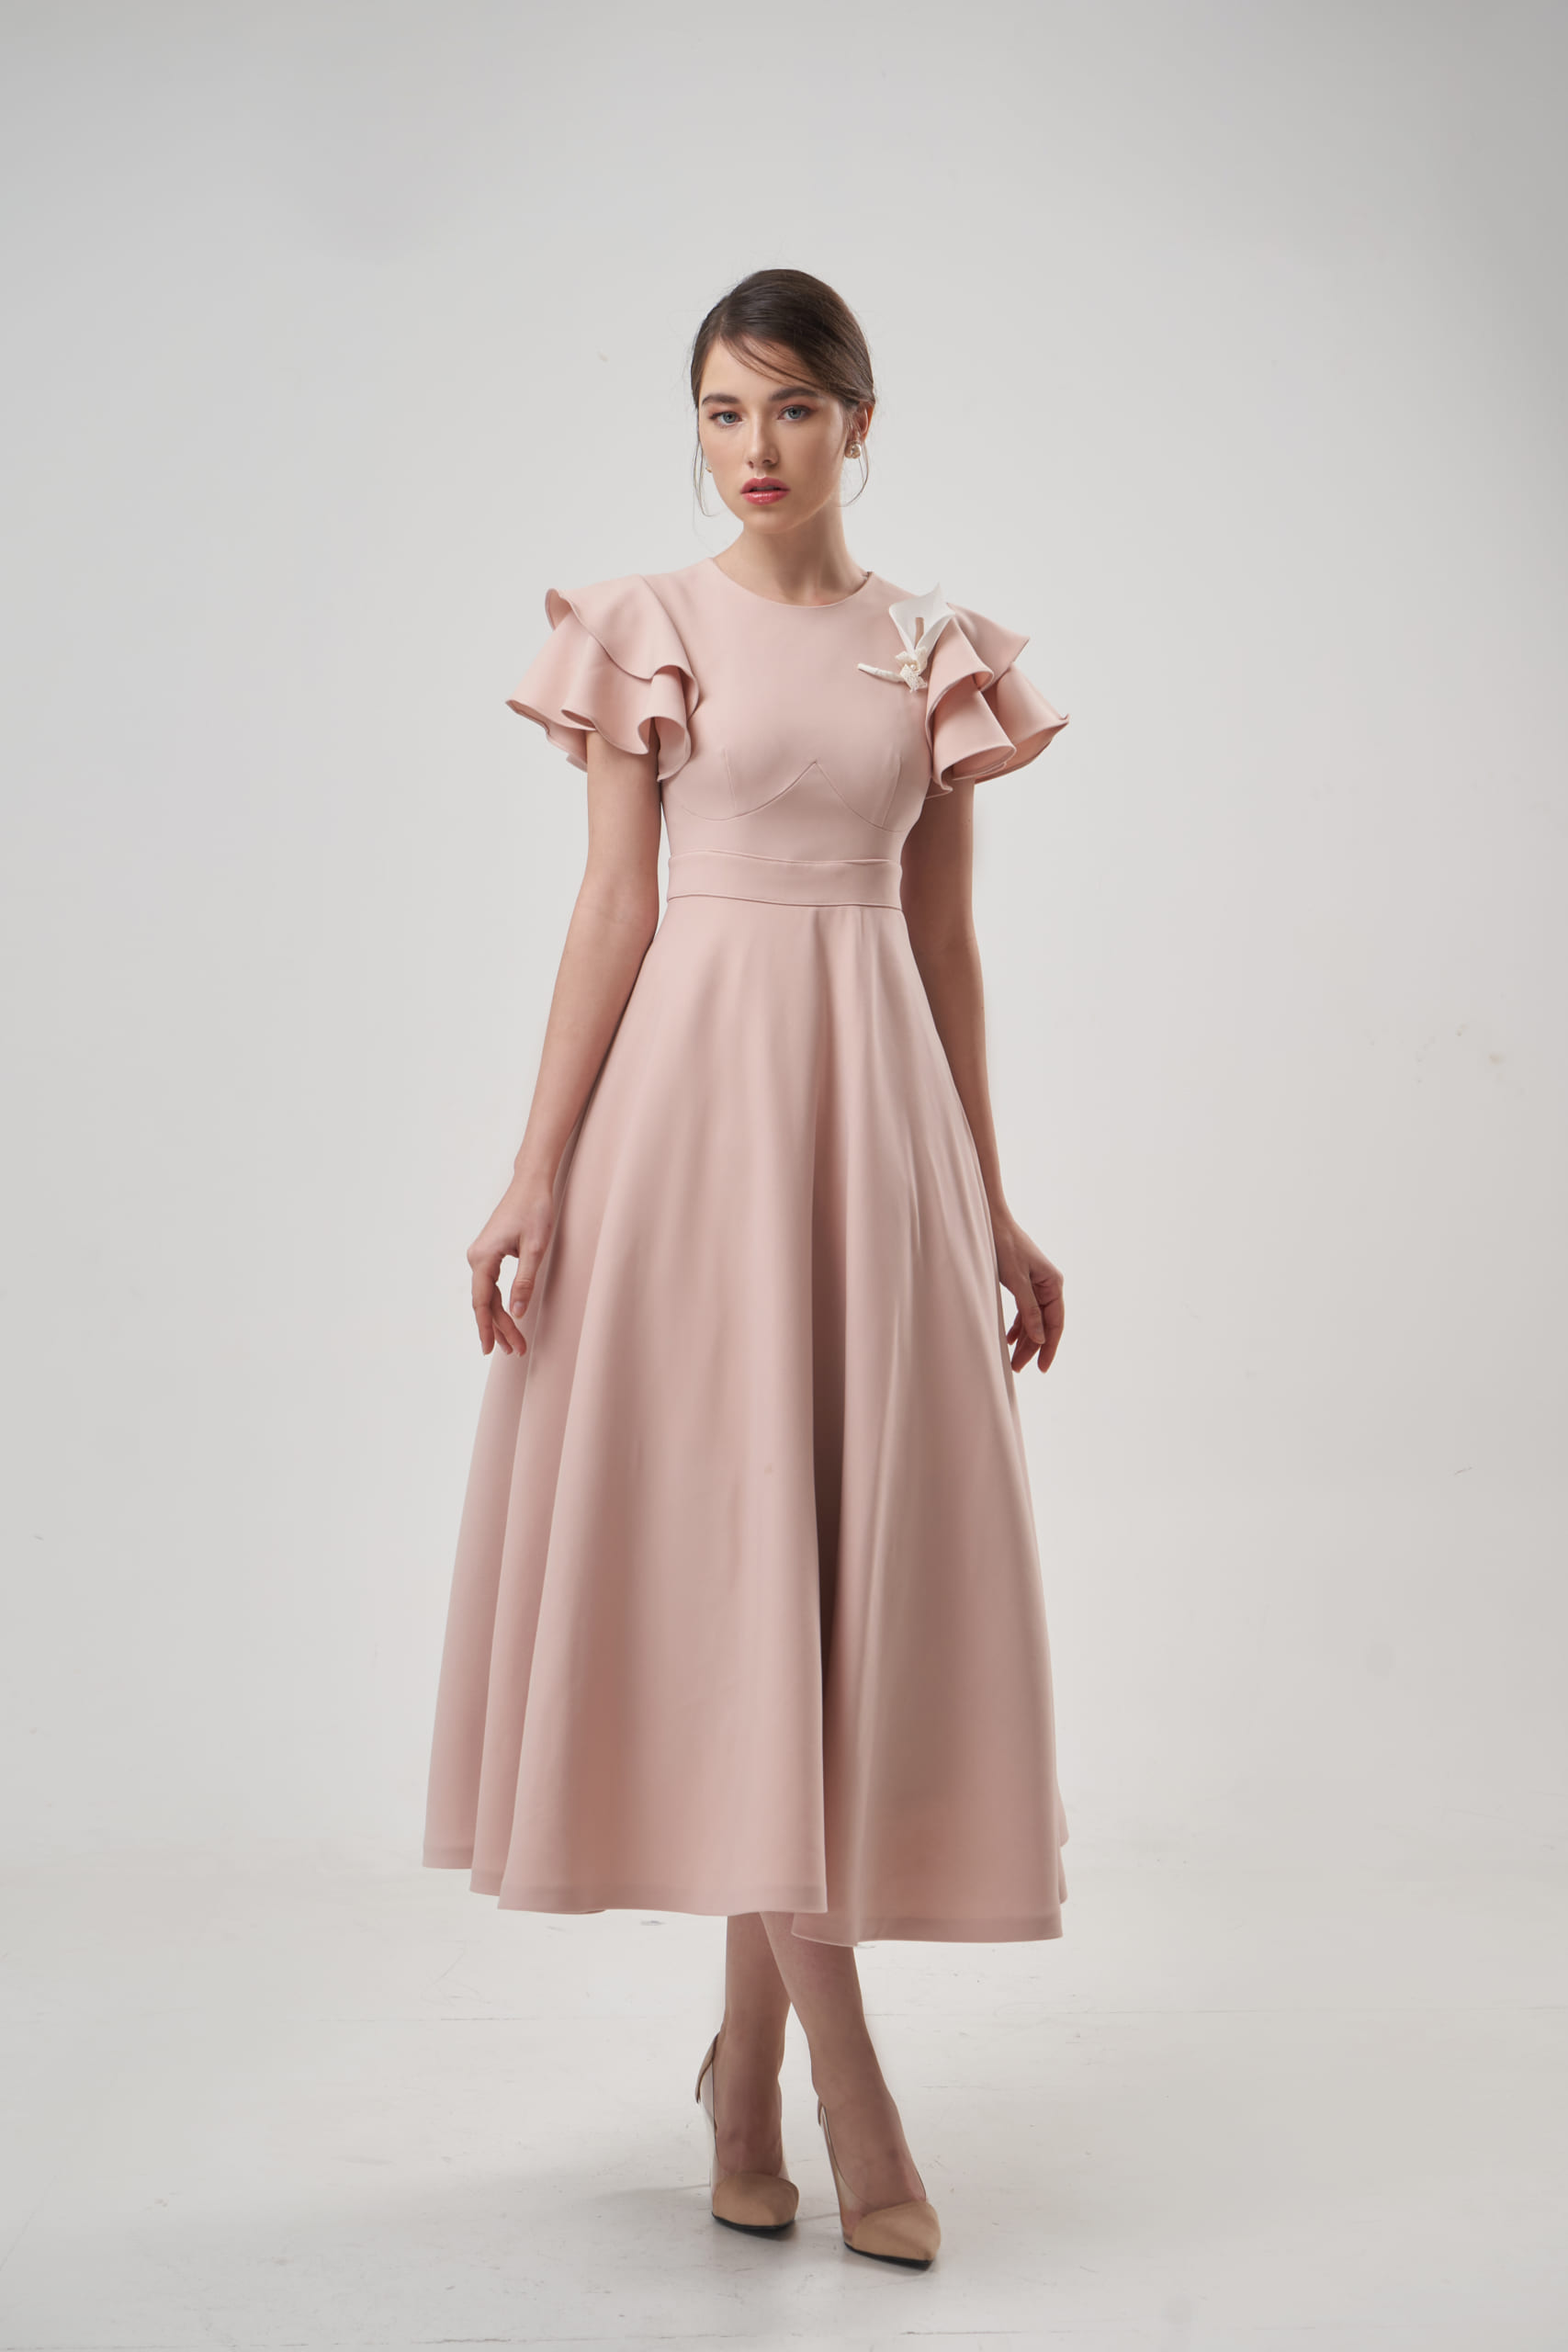 Middle Rose Dress